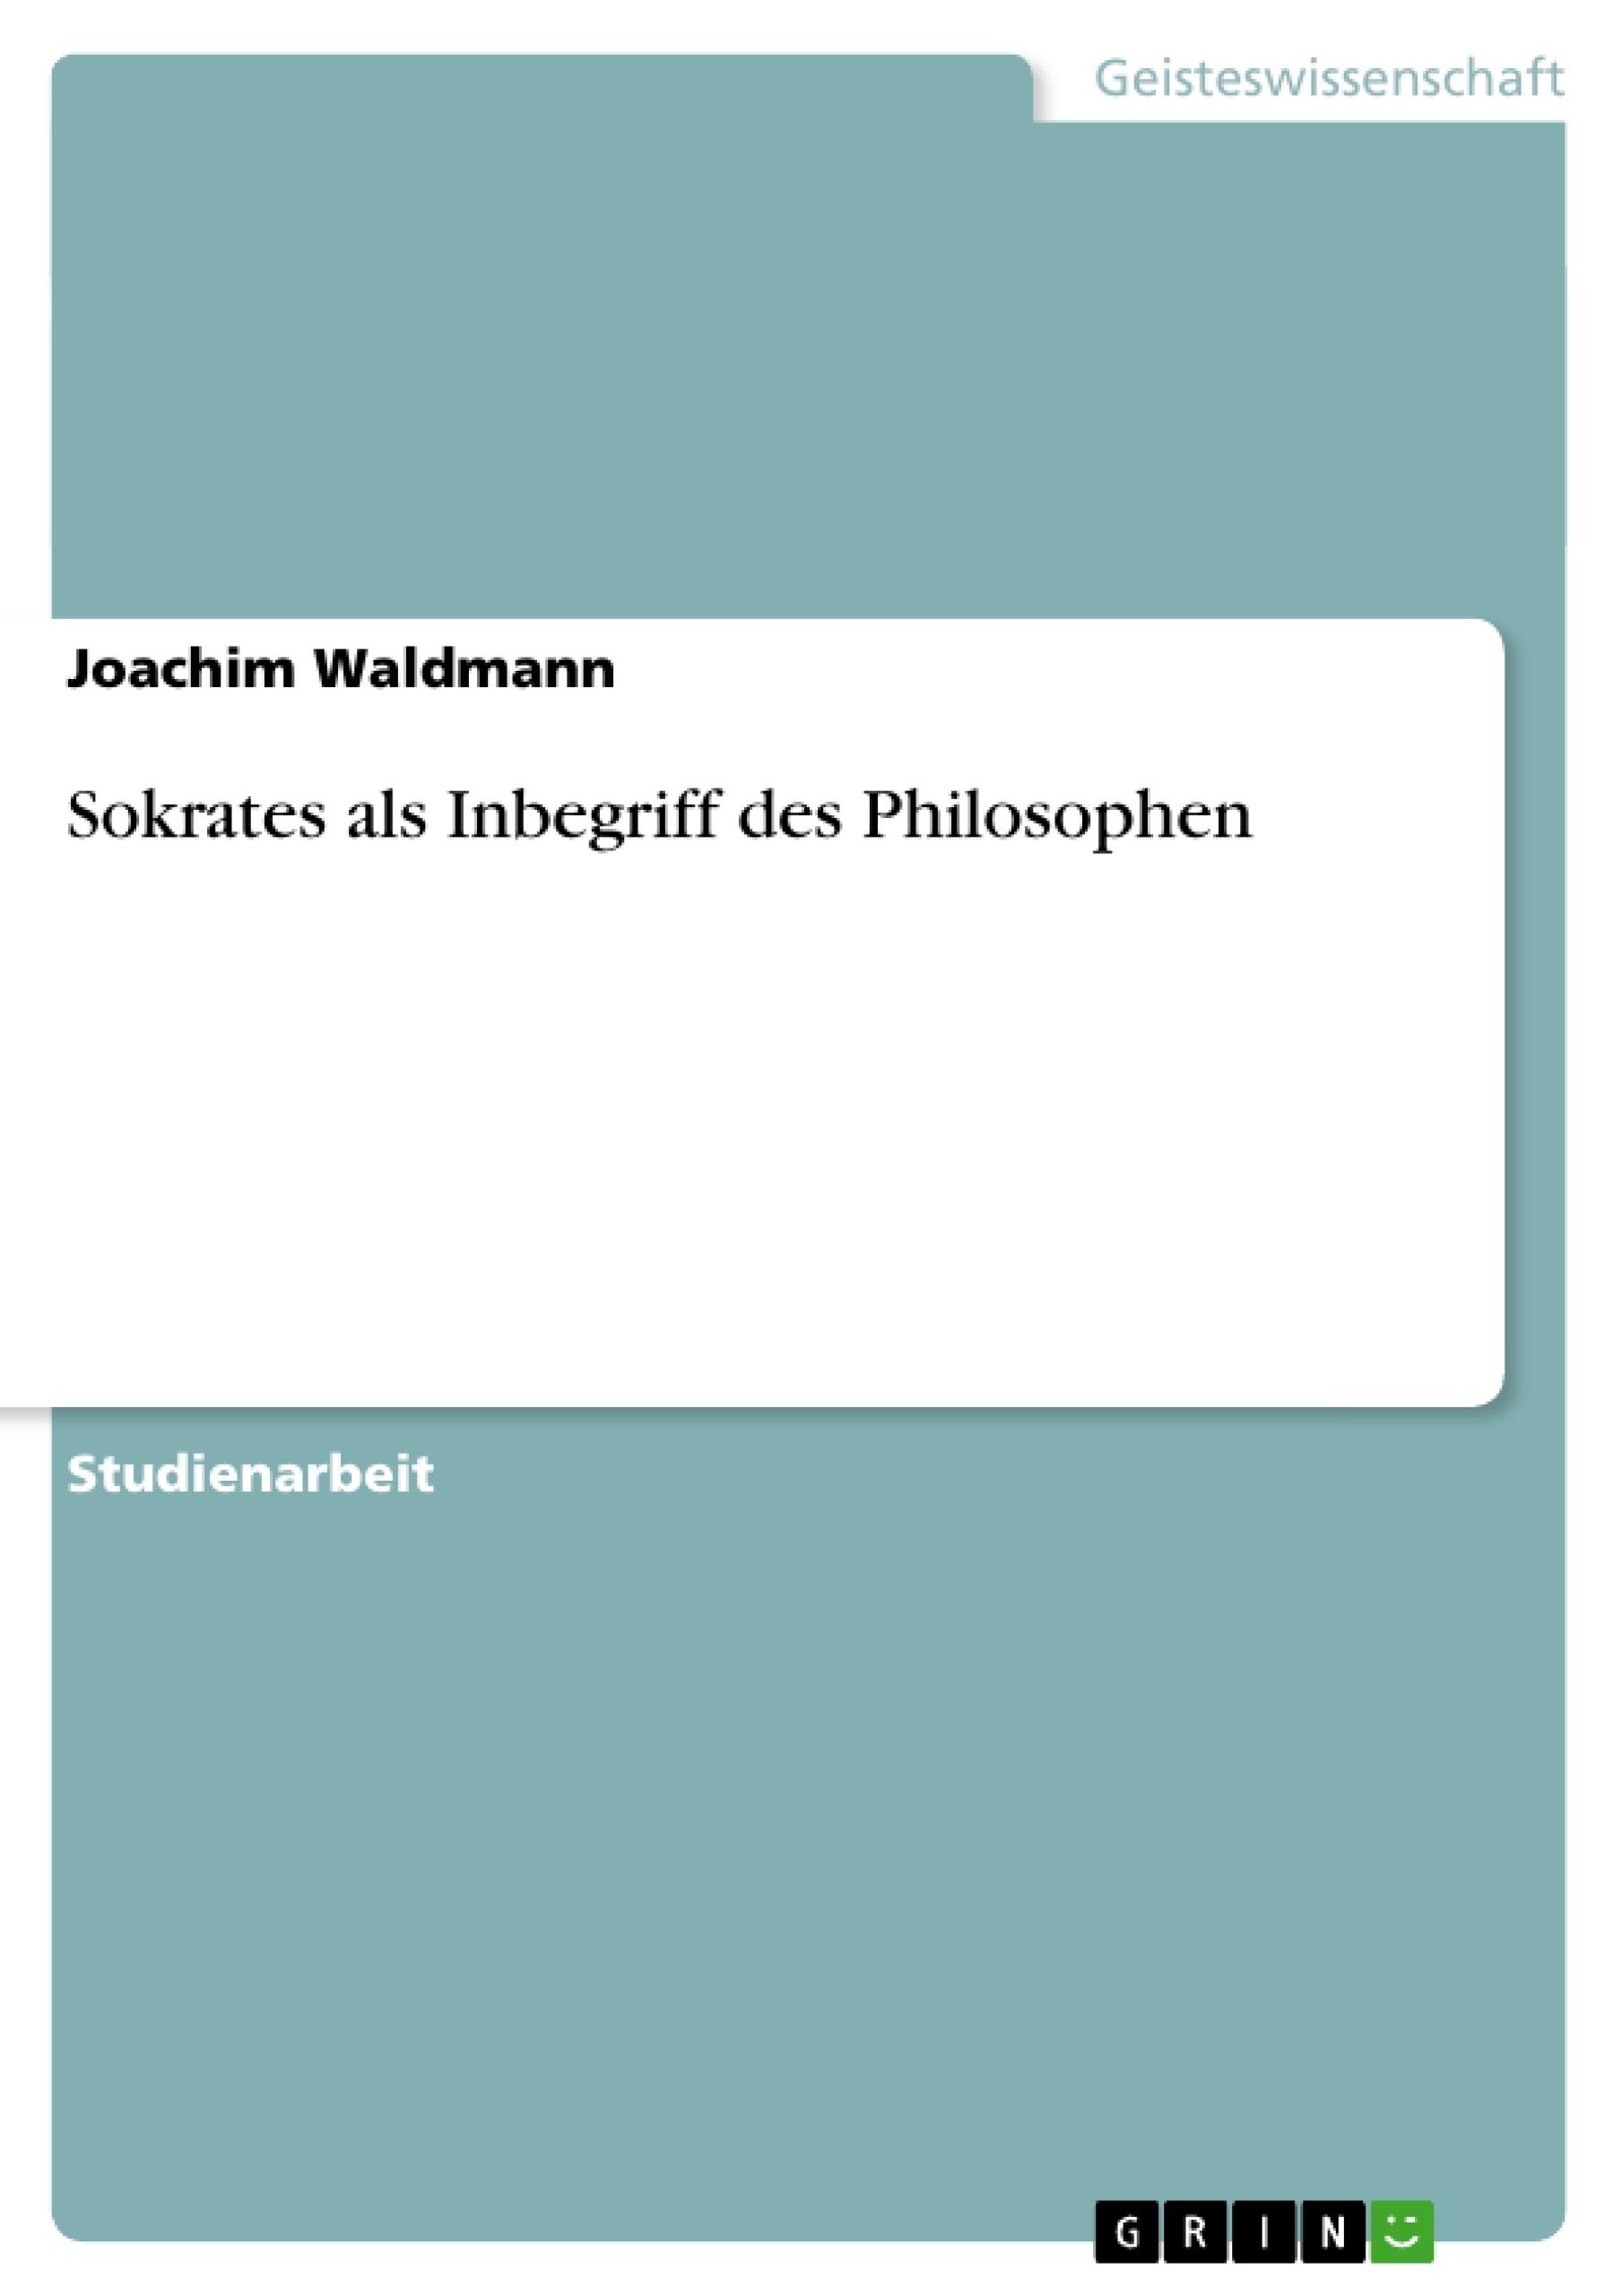 Titel: Sokrates als Inbegriff des Philosophen